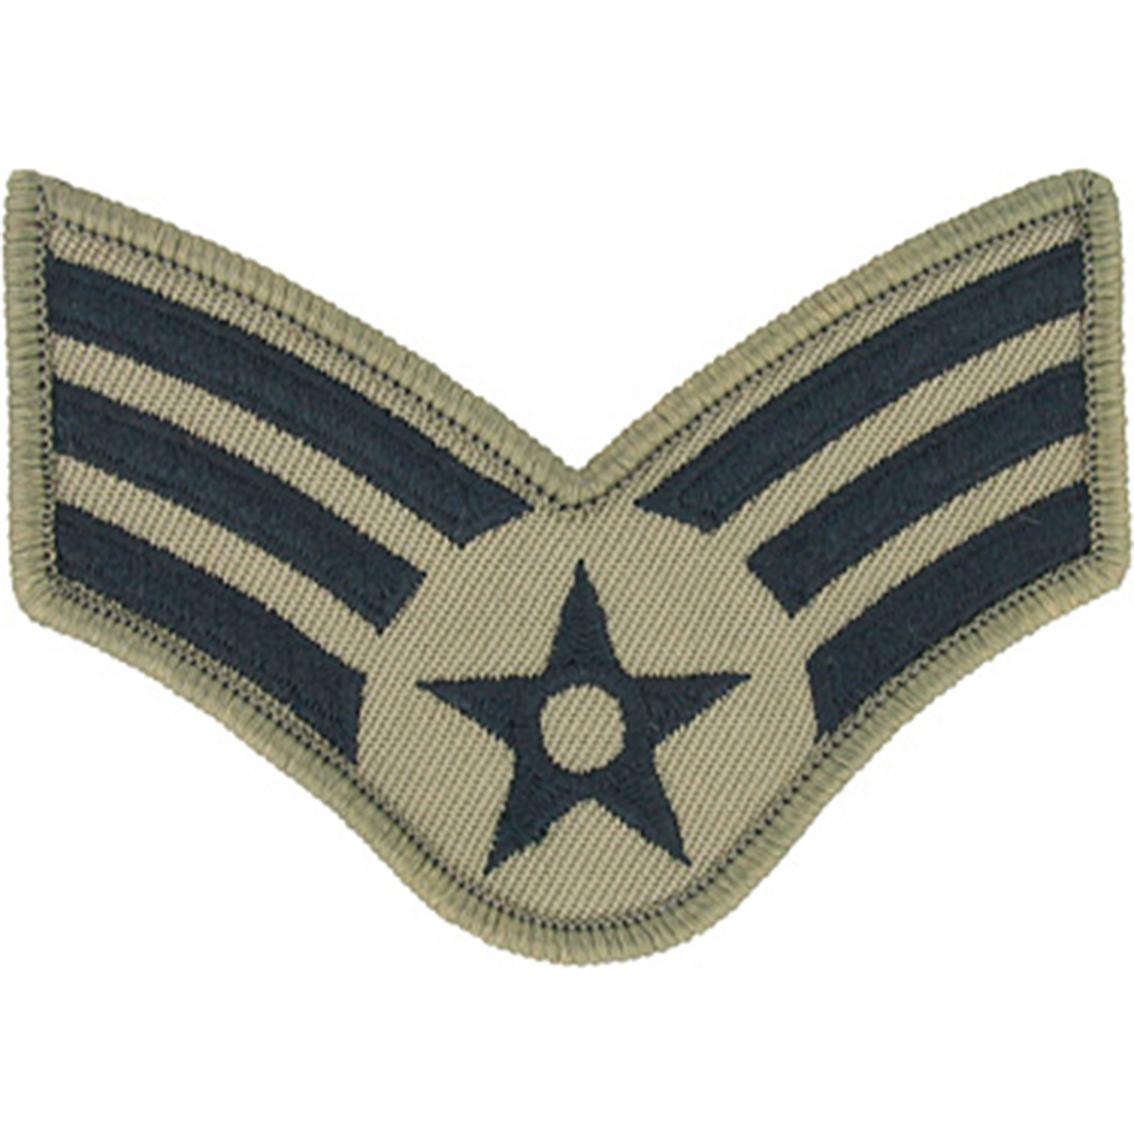 Airman Insignia